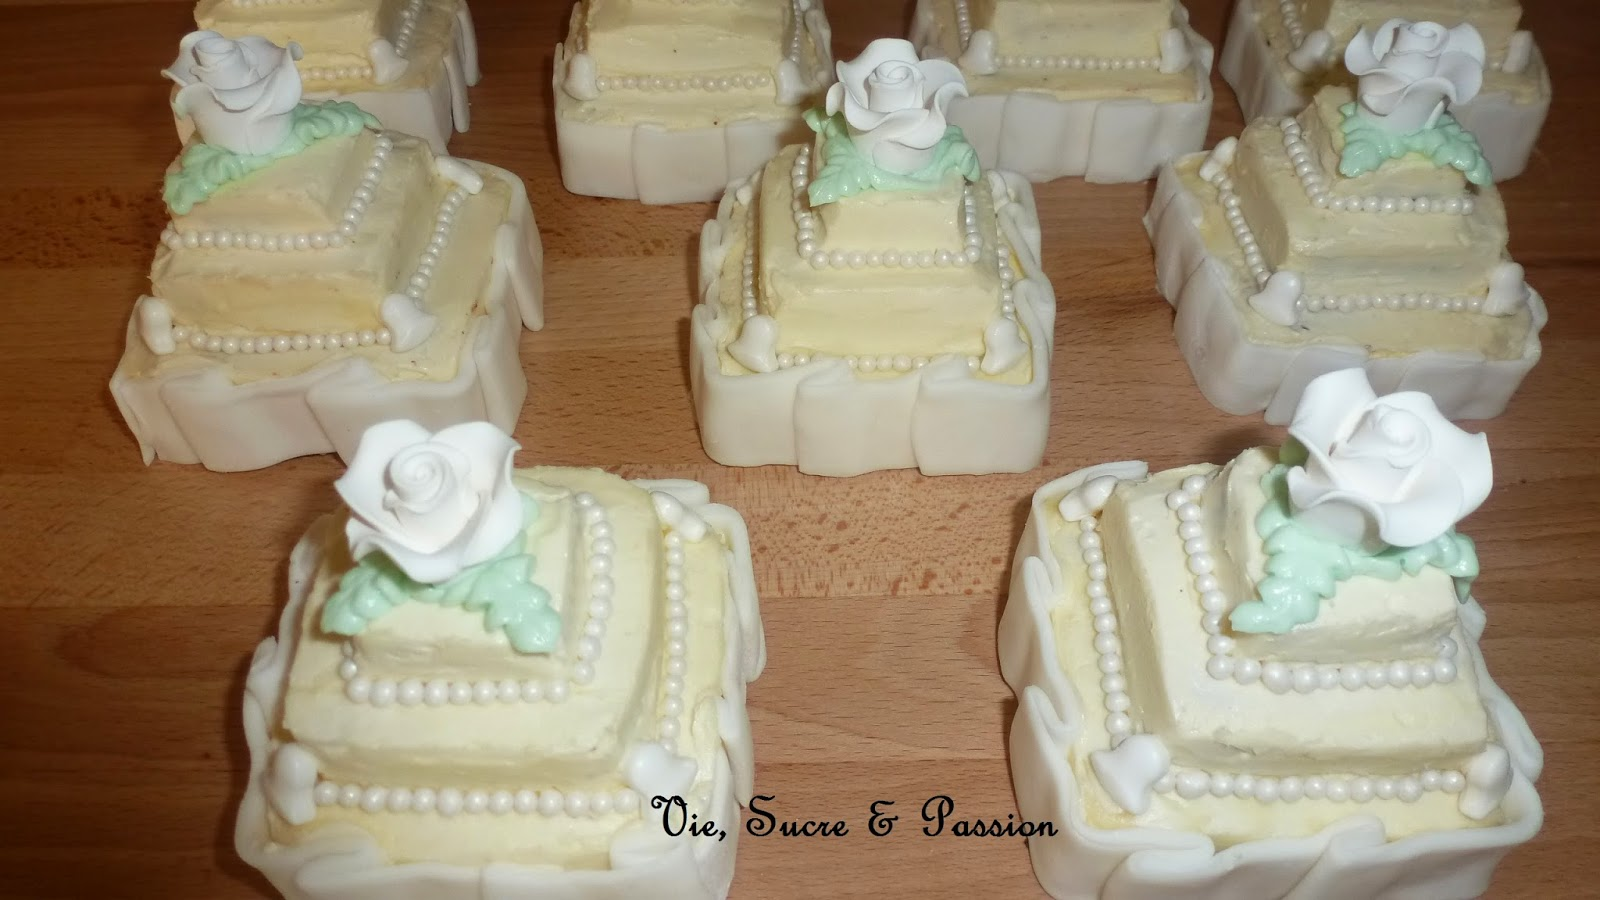 Individual cakes (wedding anniversary)